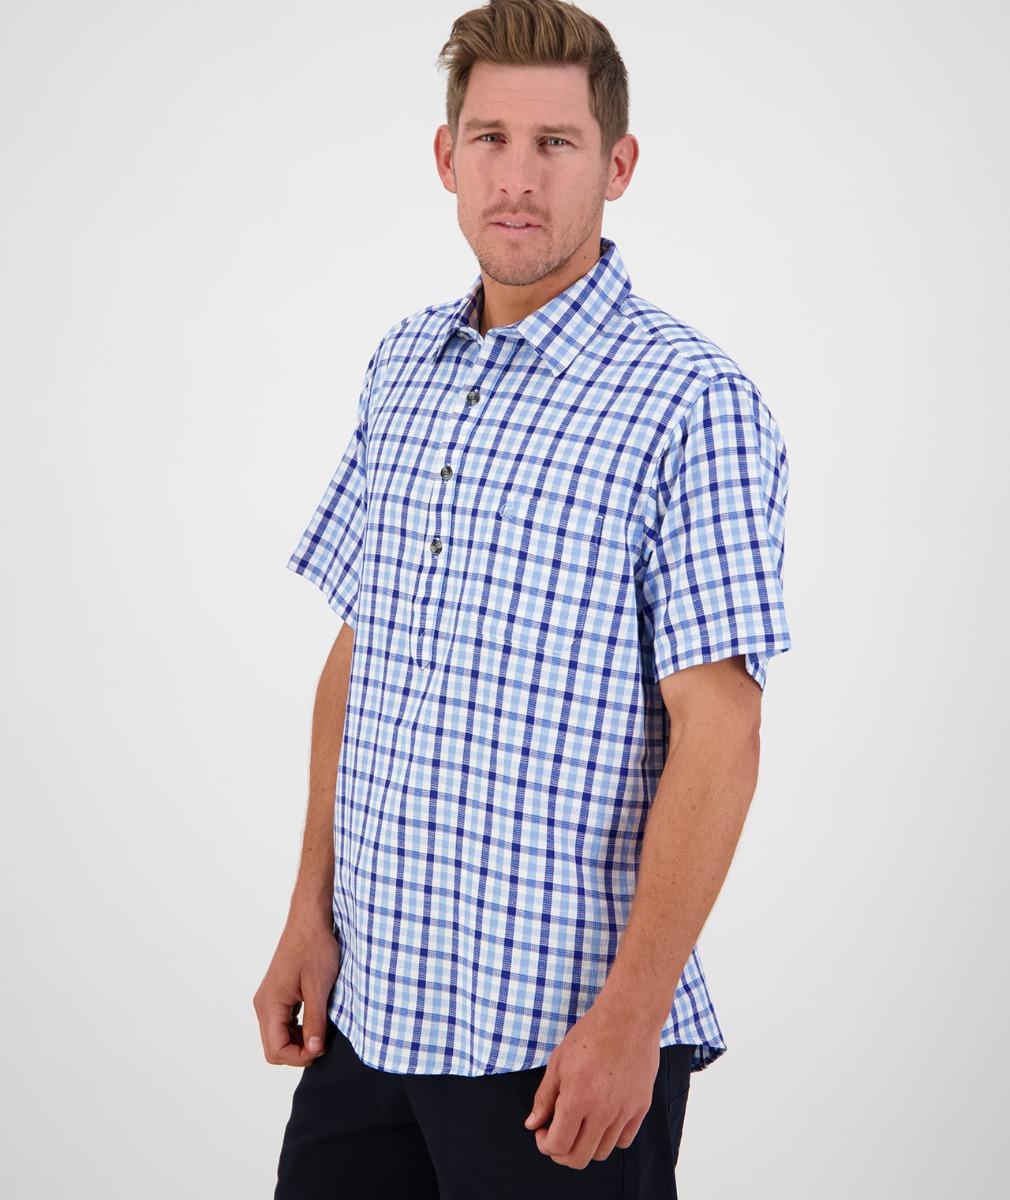 Swanndri Men's Paihia Short Sleeve Shirt in Sky/Navy Check